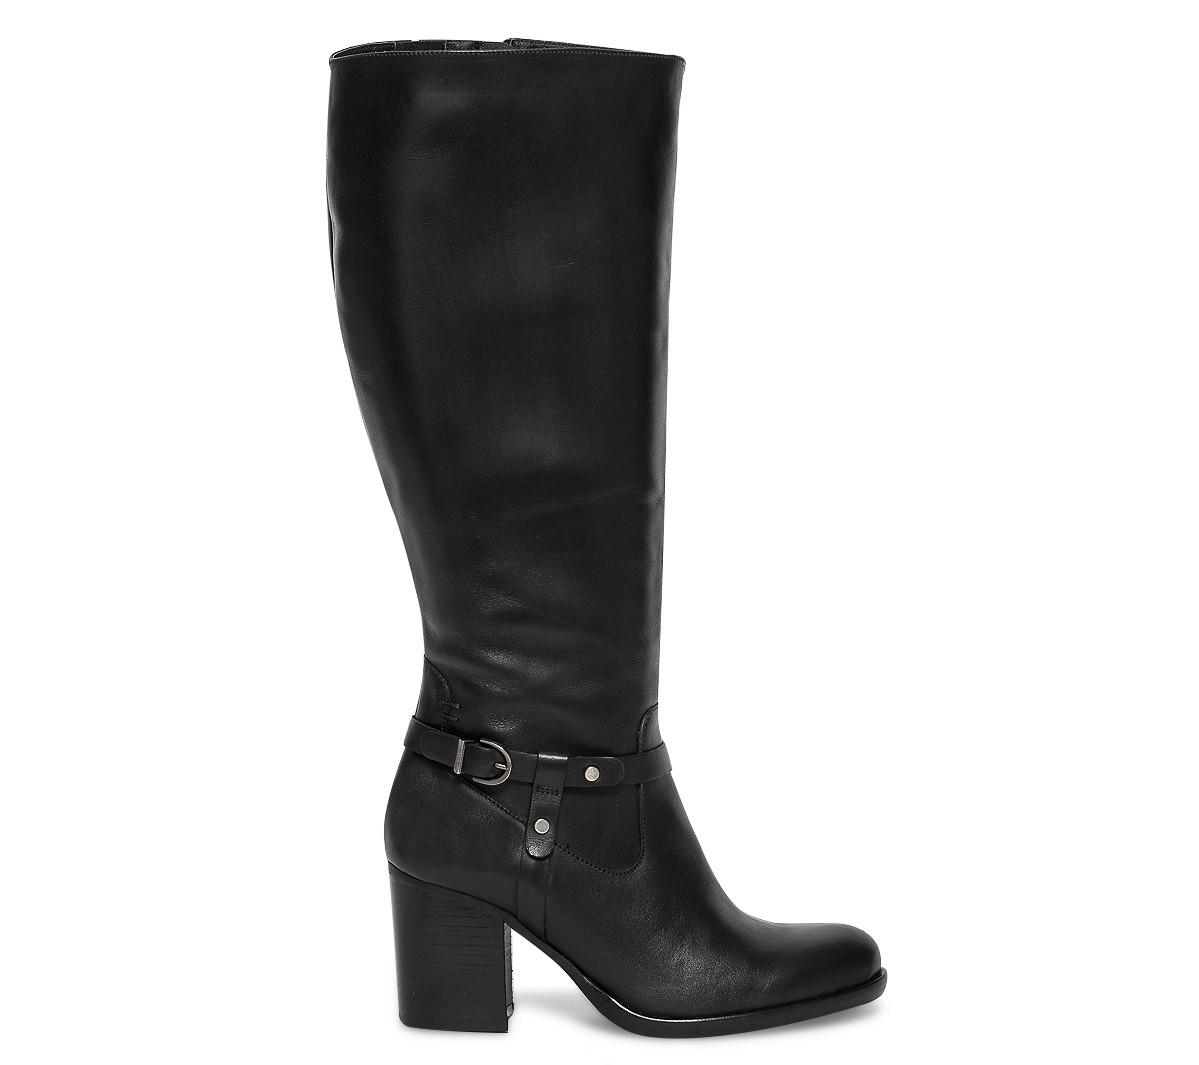 bottes mollets larges pour se sentir bien dans ses chaussures. Black Bedroom Furniture Sets. Home Design Ideas